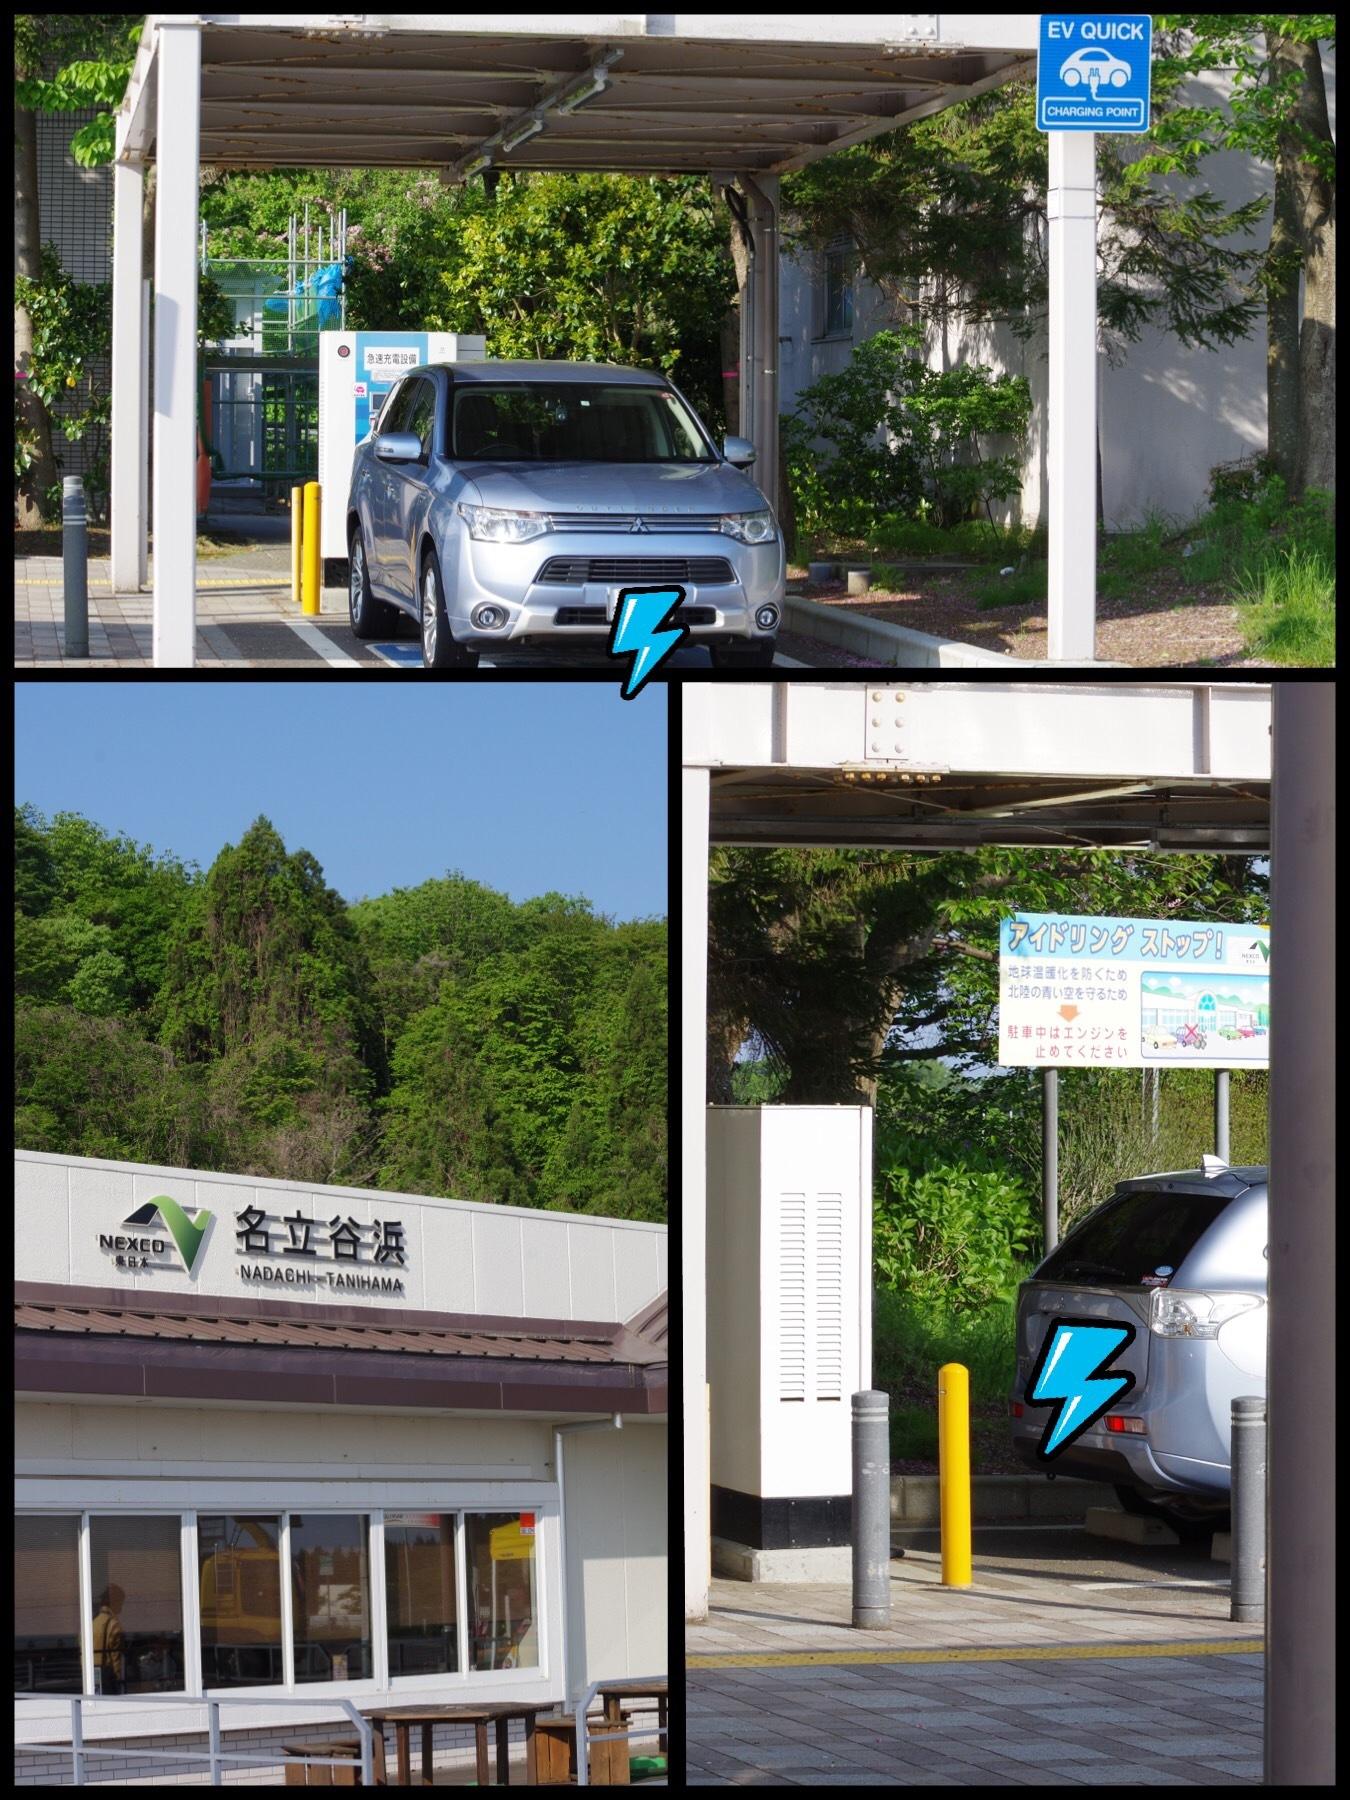 EV充電スポット 北陸自動車道 名立谷浜SA 上り